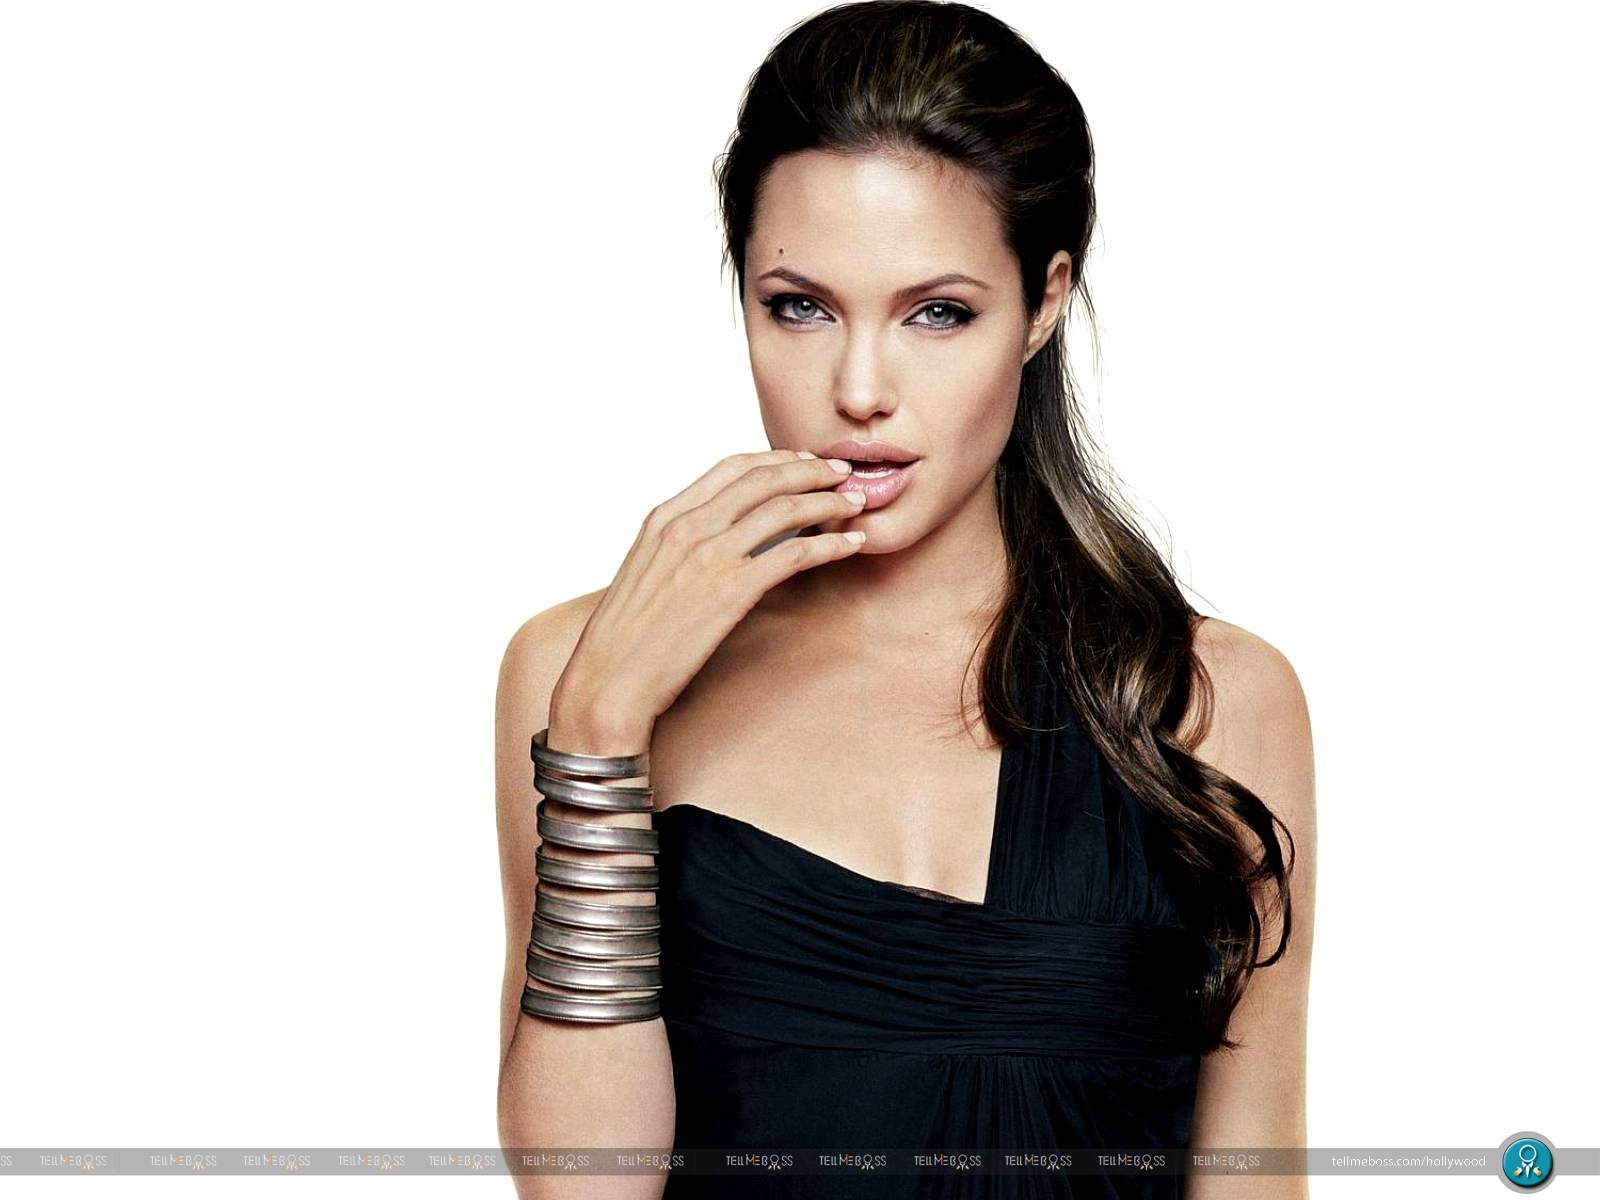 Angelina Jolie Hot Stills angelina jolie hot photos 3 hd wallpapers | movies songs lyrics